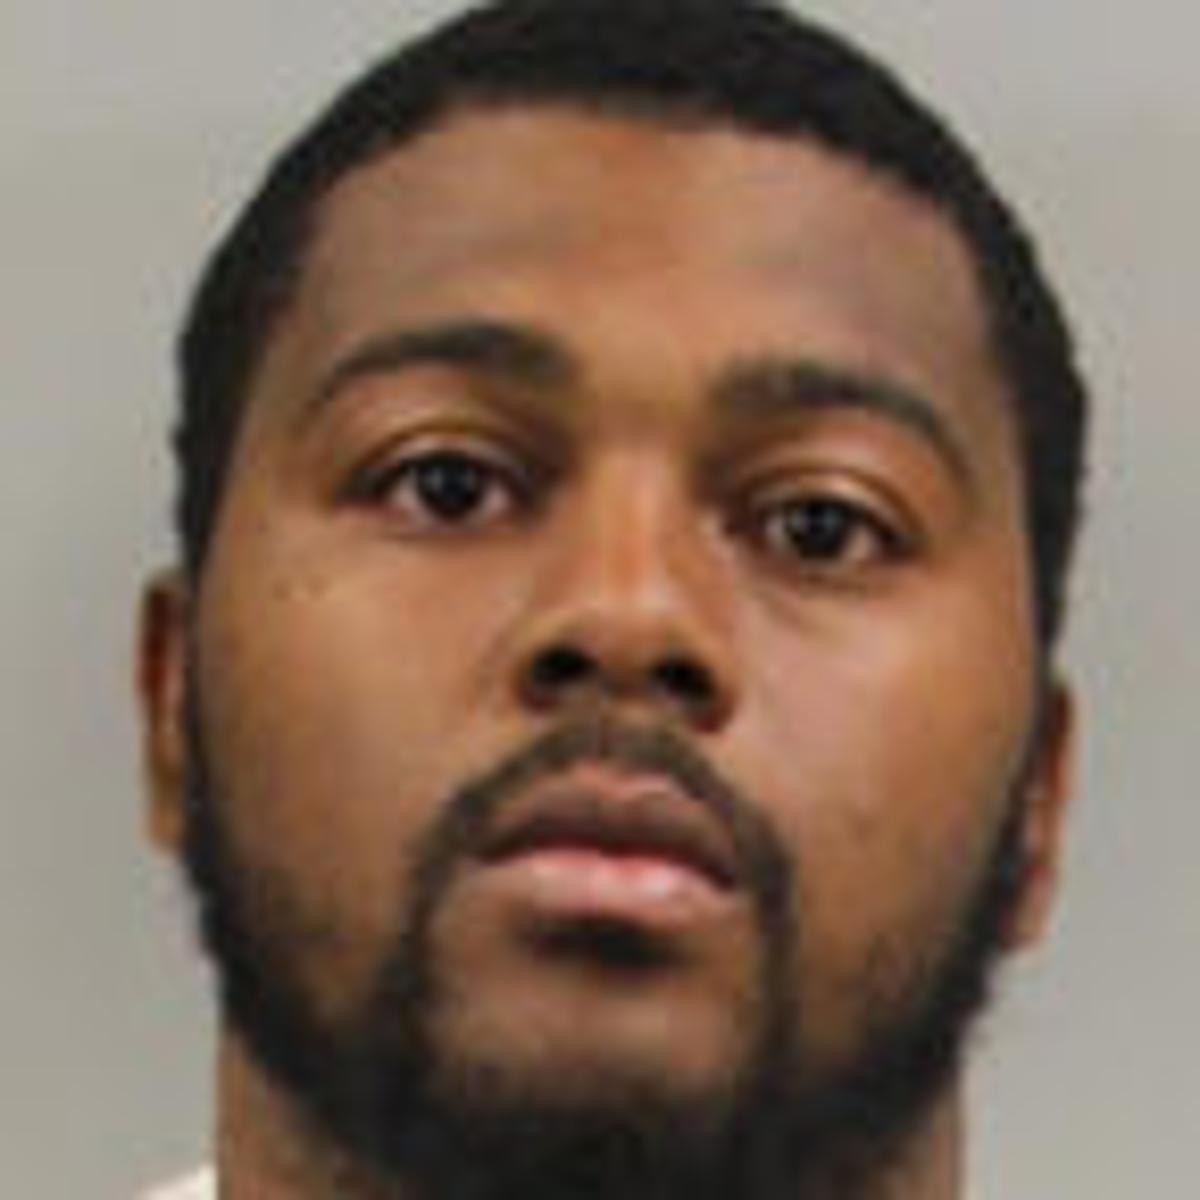 Greensboro man 1 of 3 charged in Sunday killing in Asheboro